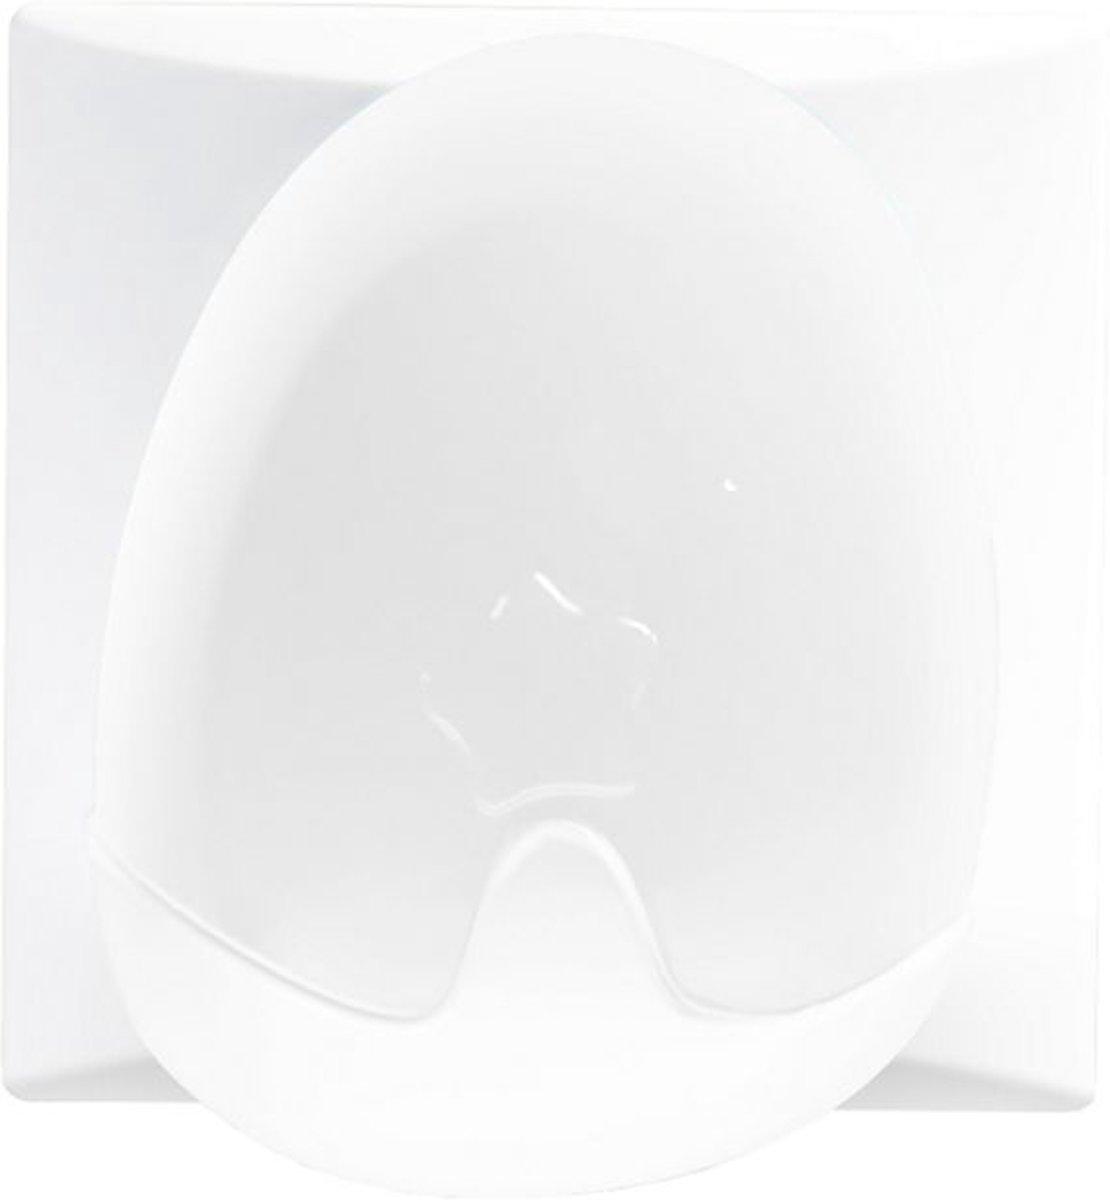 Pabobo - Wit - Automatisch nachtlampje - Automatisch - Hoe donkerder, hoe harder hij brandt!